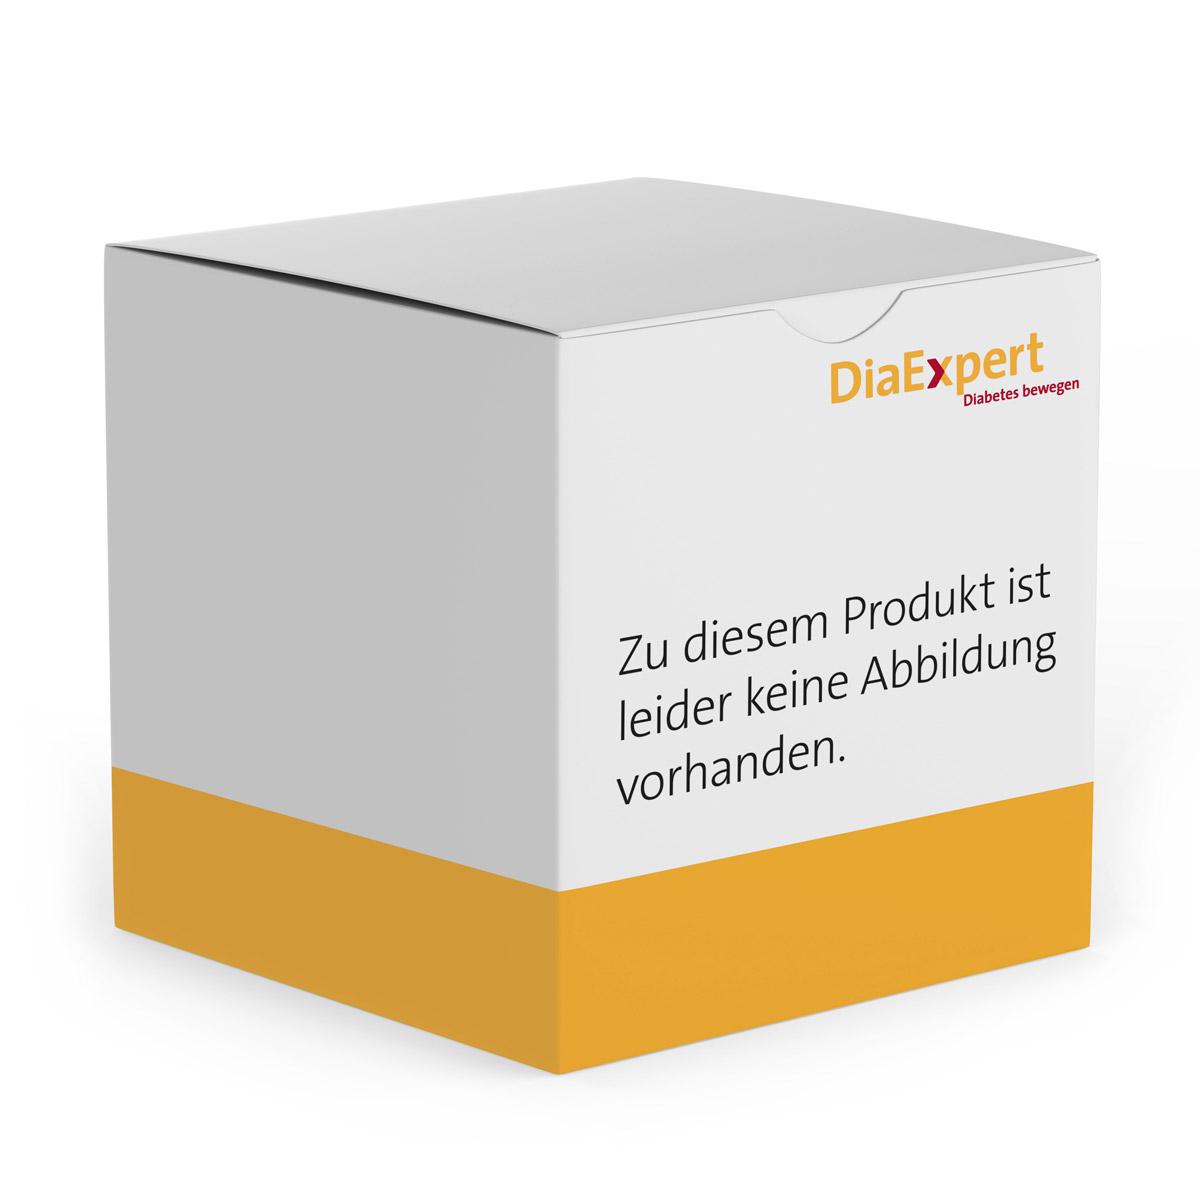 Accu-Chek 3.15 ml Ampullensystem